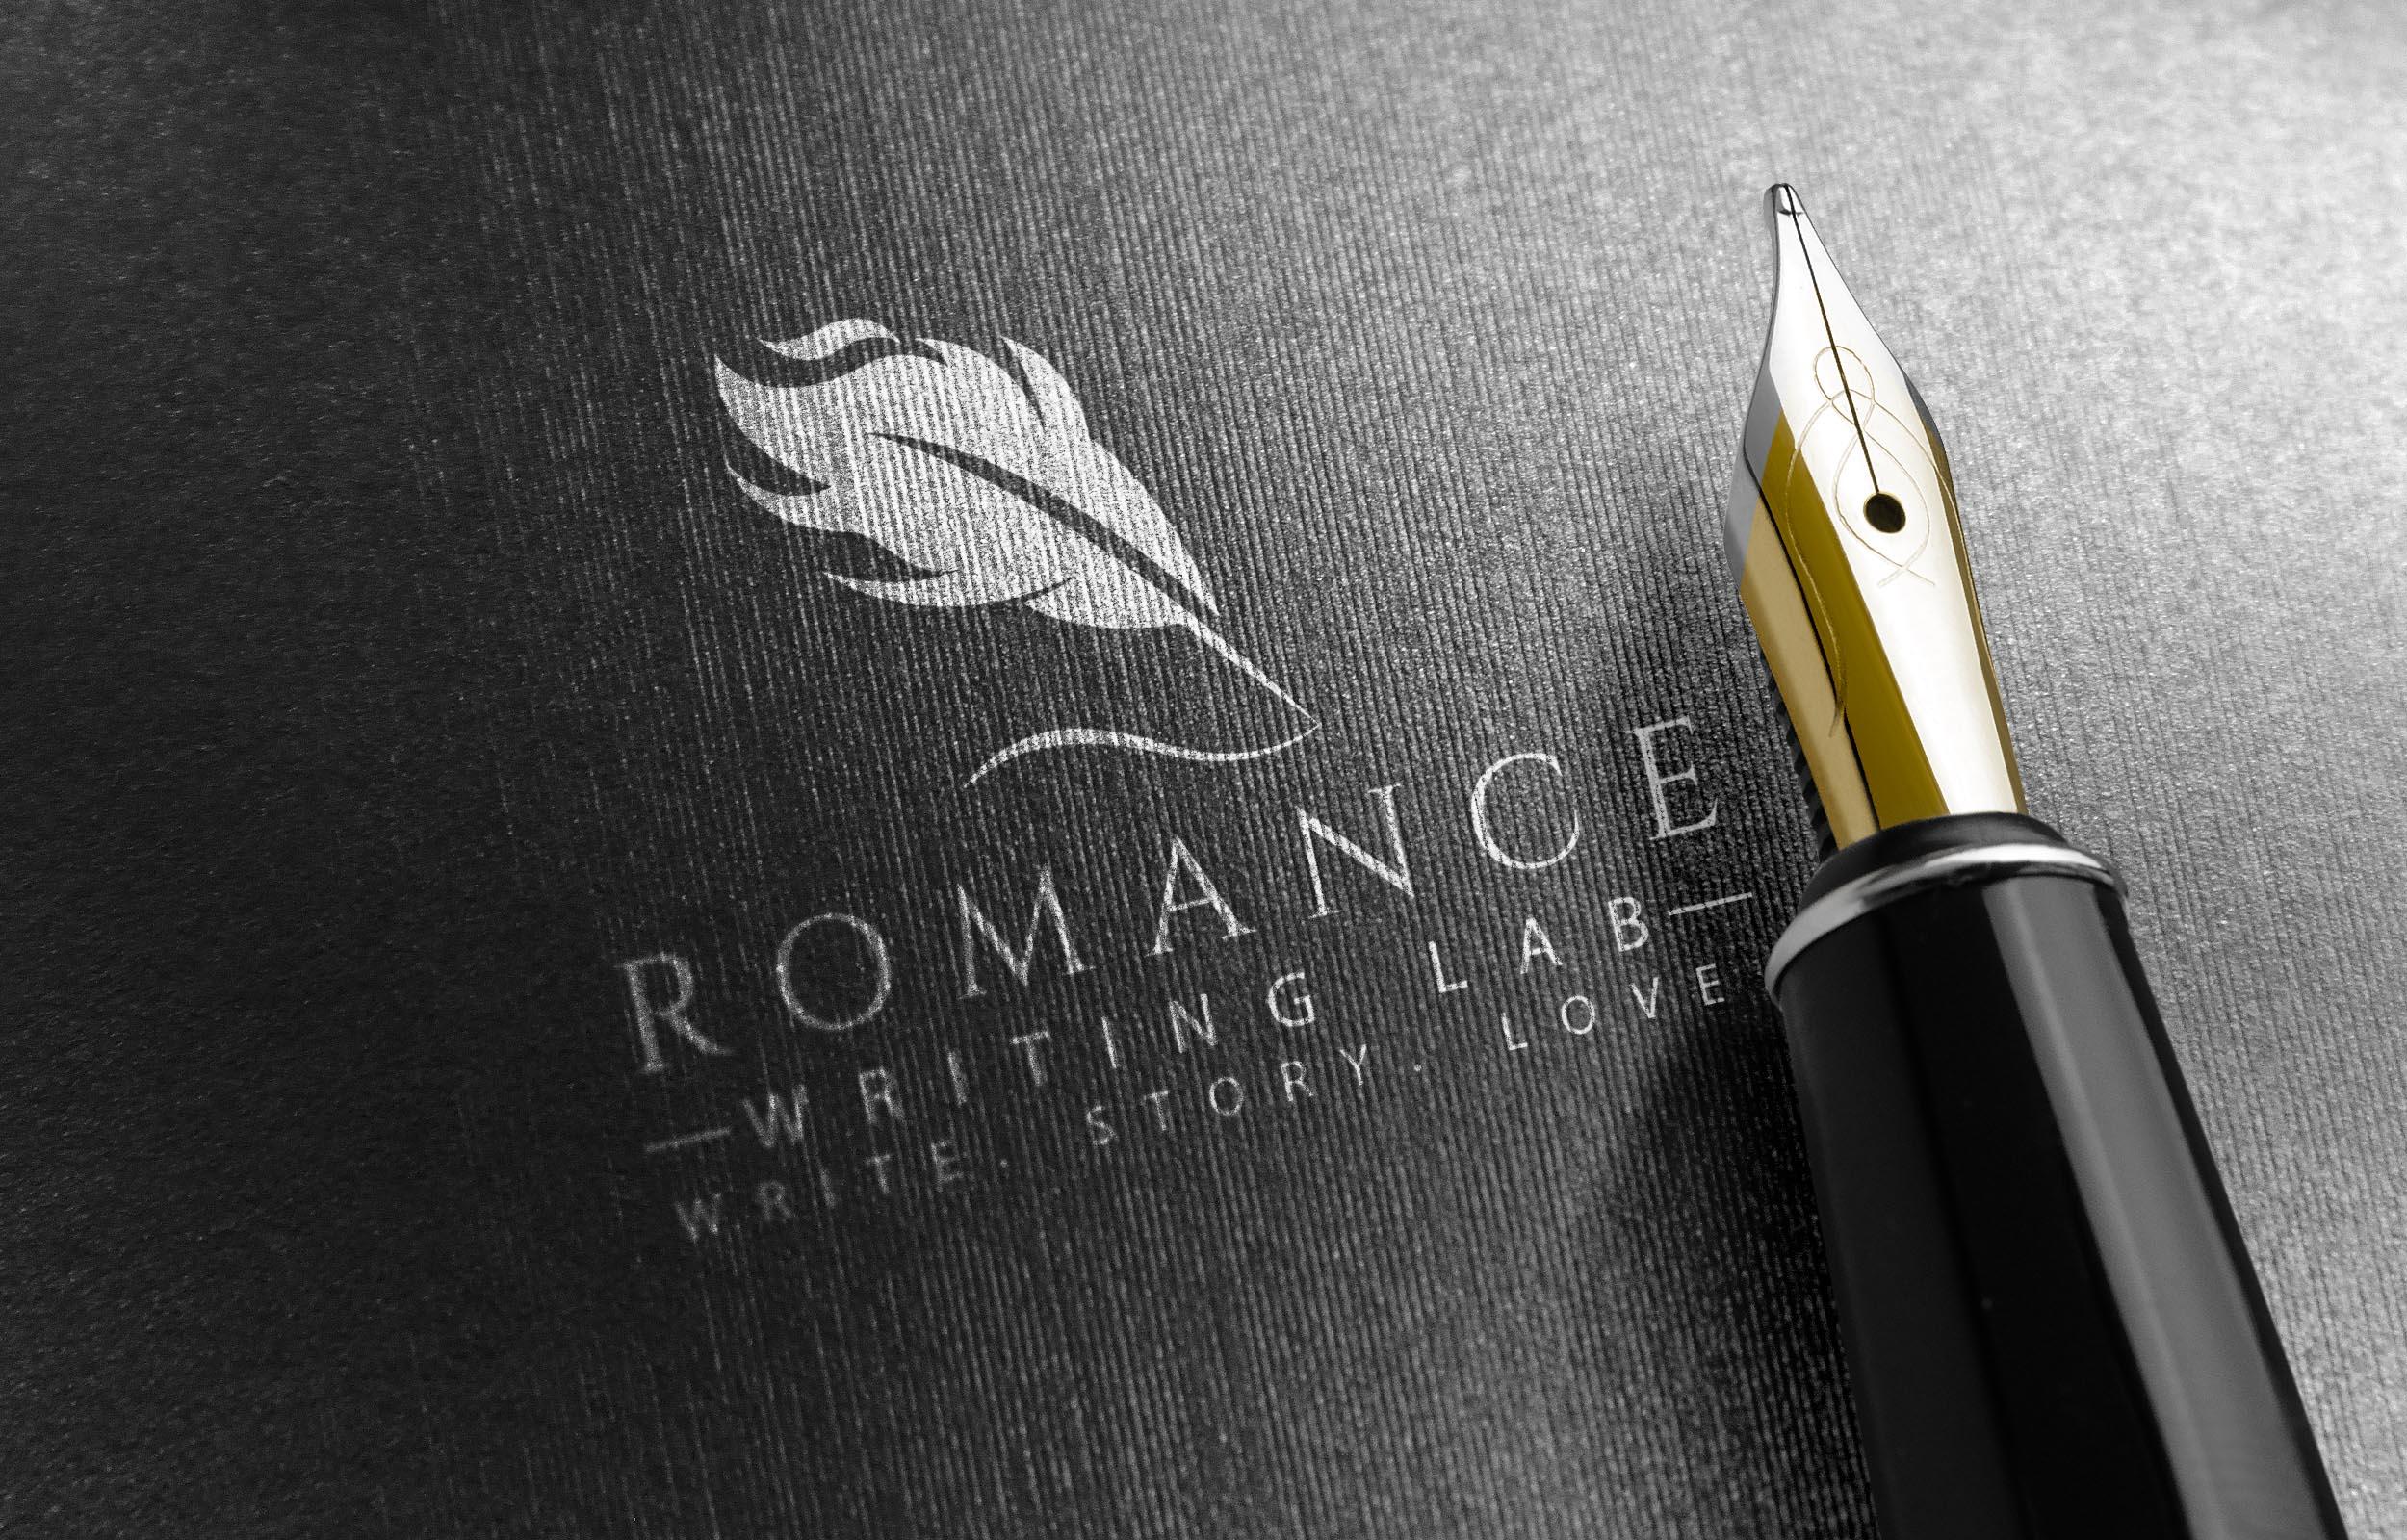 Romance Writing Lab logo with pen nib